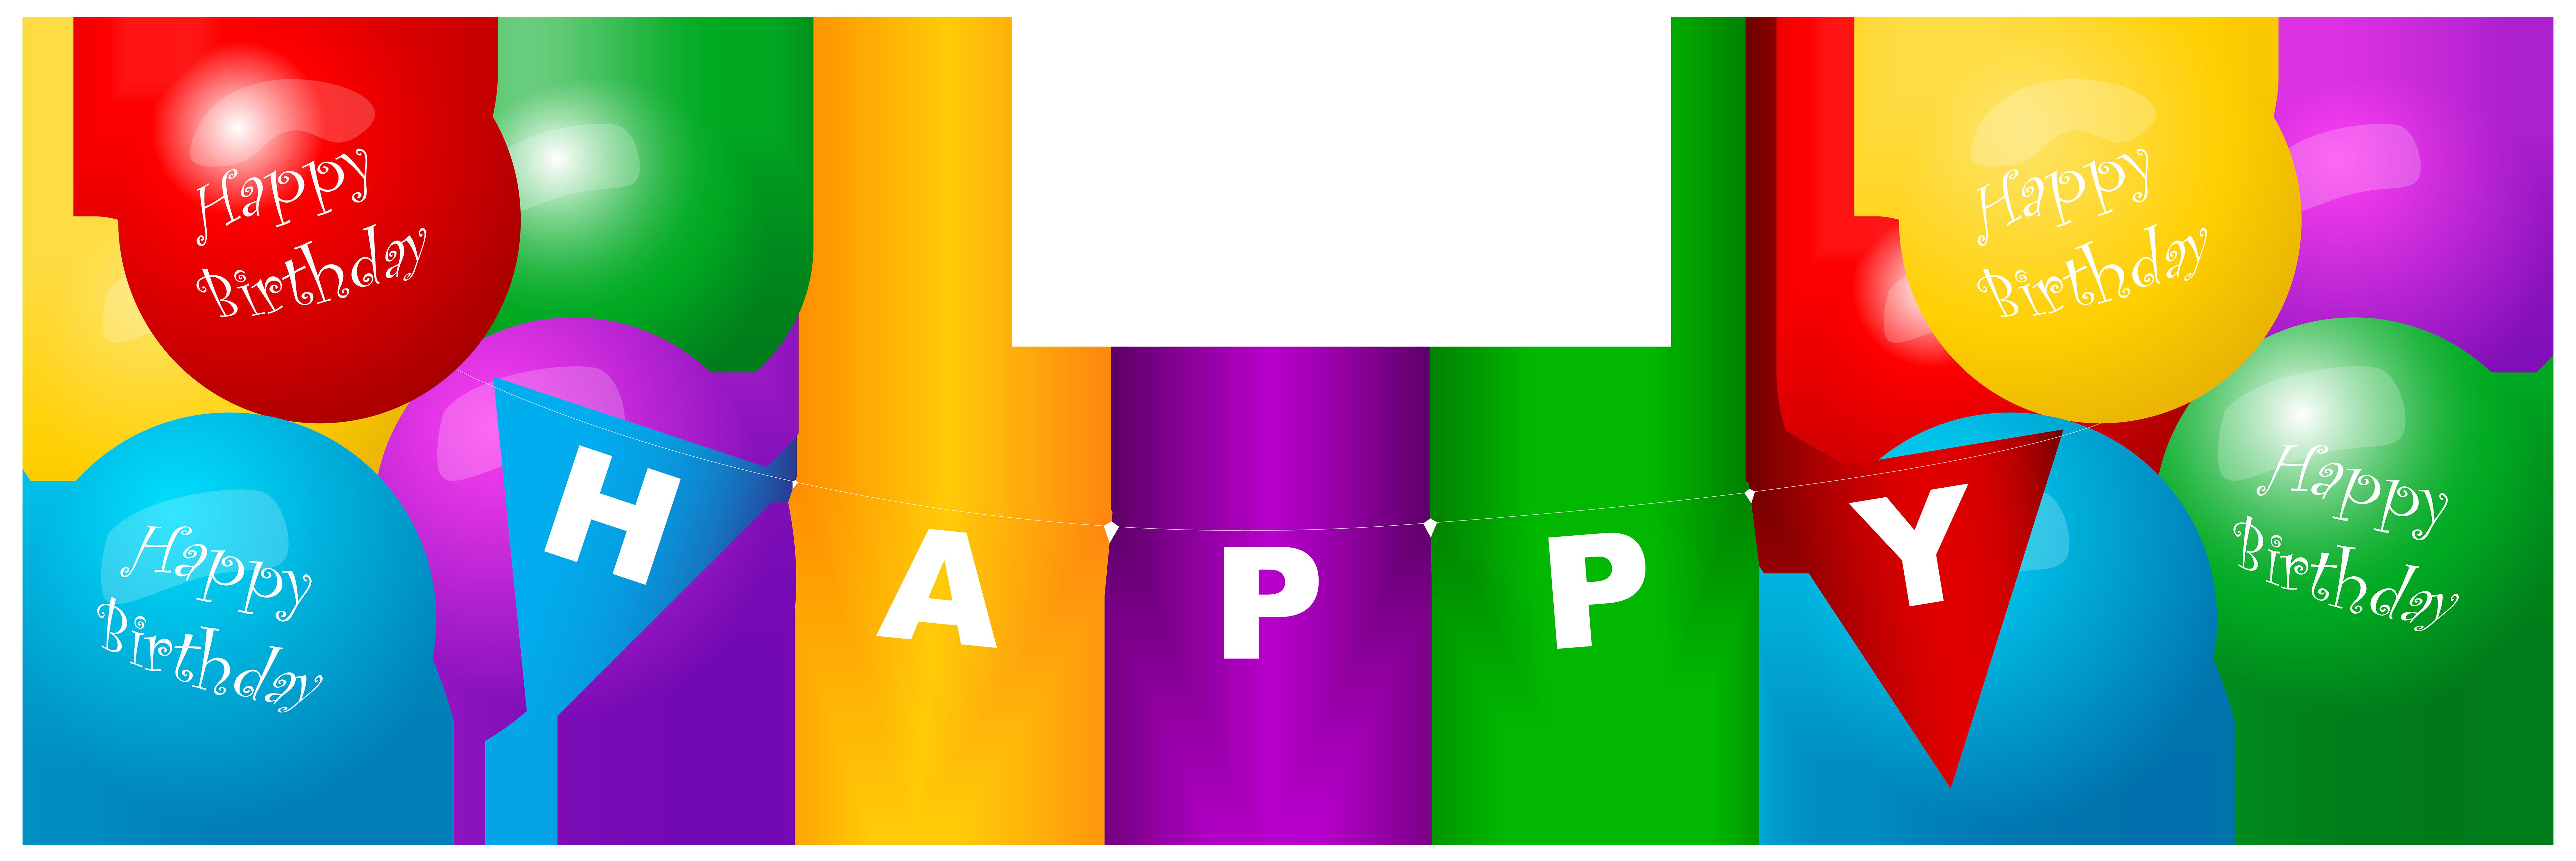 8000x2673 Happy Birthday Deco Balloons Png Clip Art Imageu200b Gallery